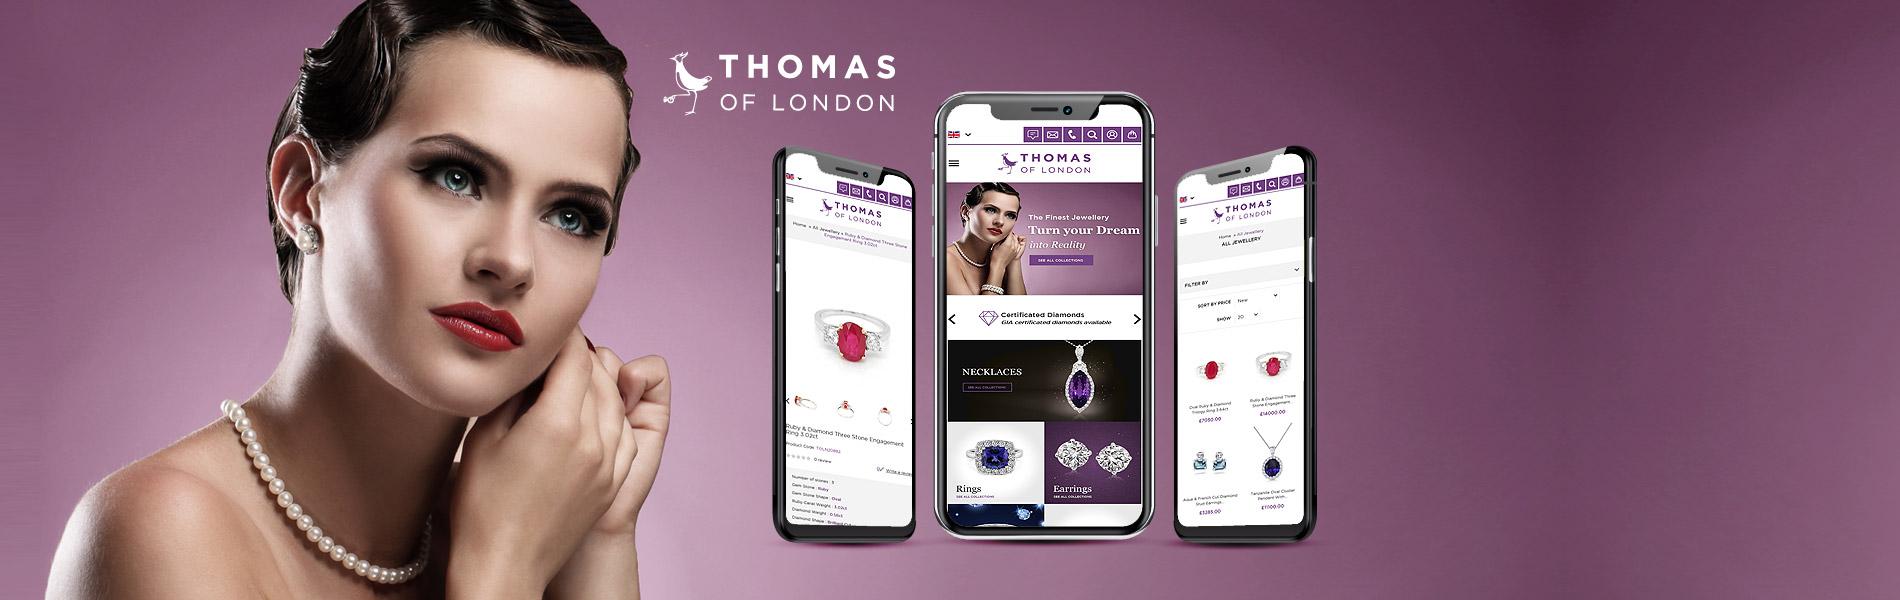 Thomas of London